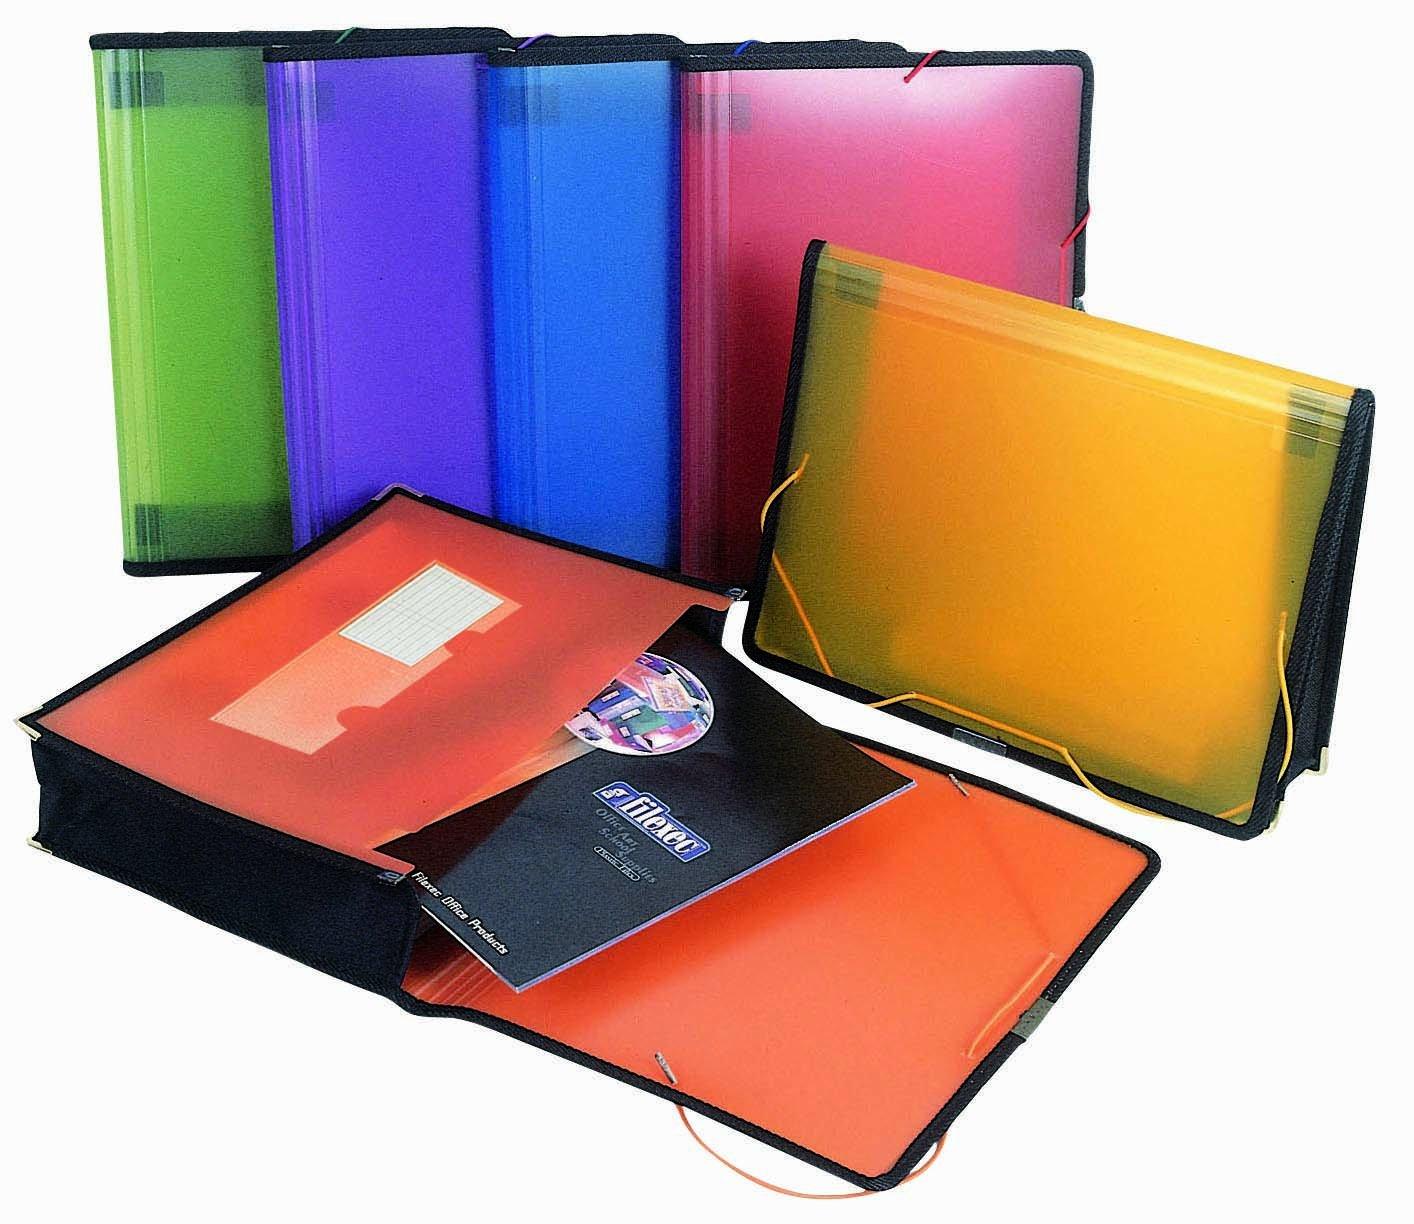 Filexec Single Pocket Expanding File, Letter, Elastic Closure, Assorted, Pack of 6 (50125-3429) by Filexec